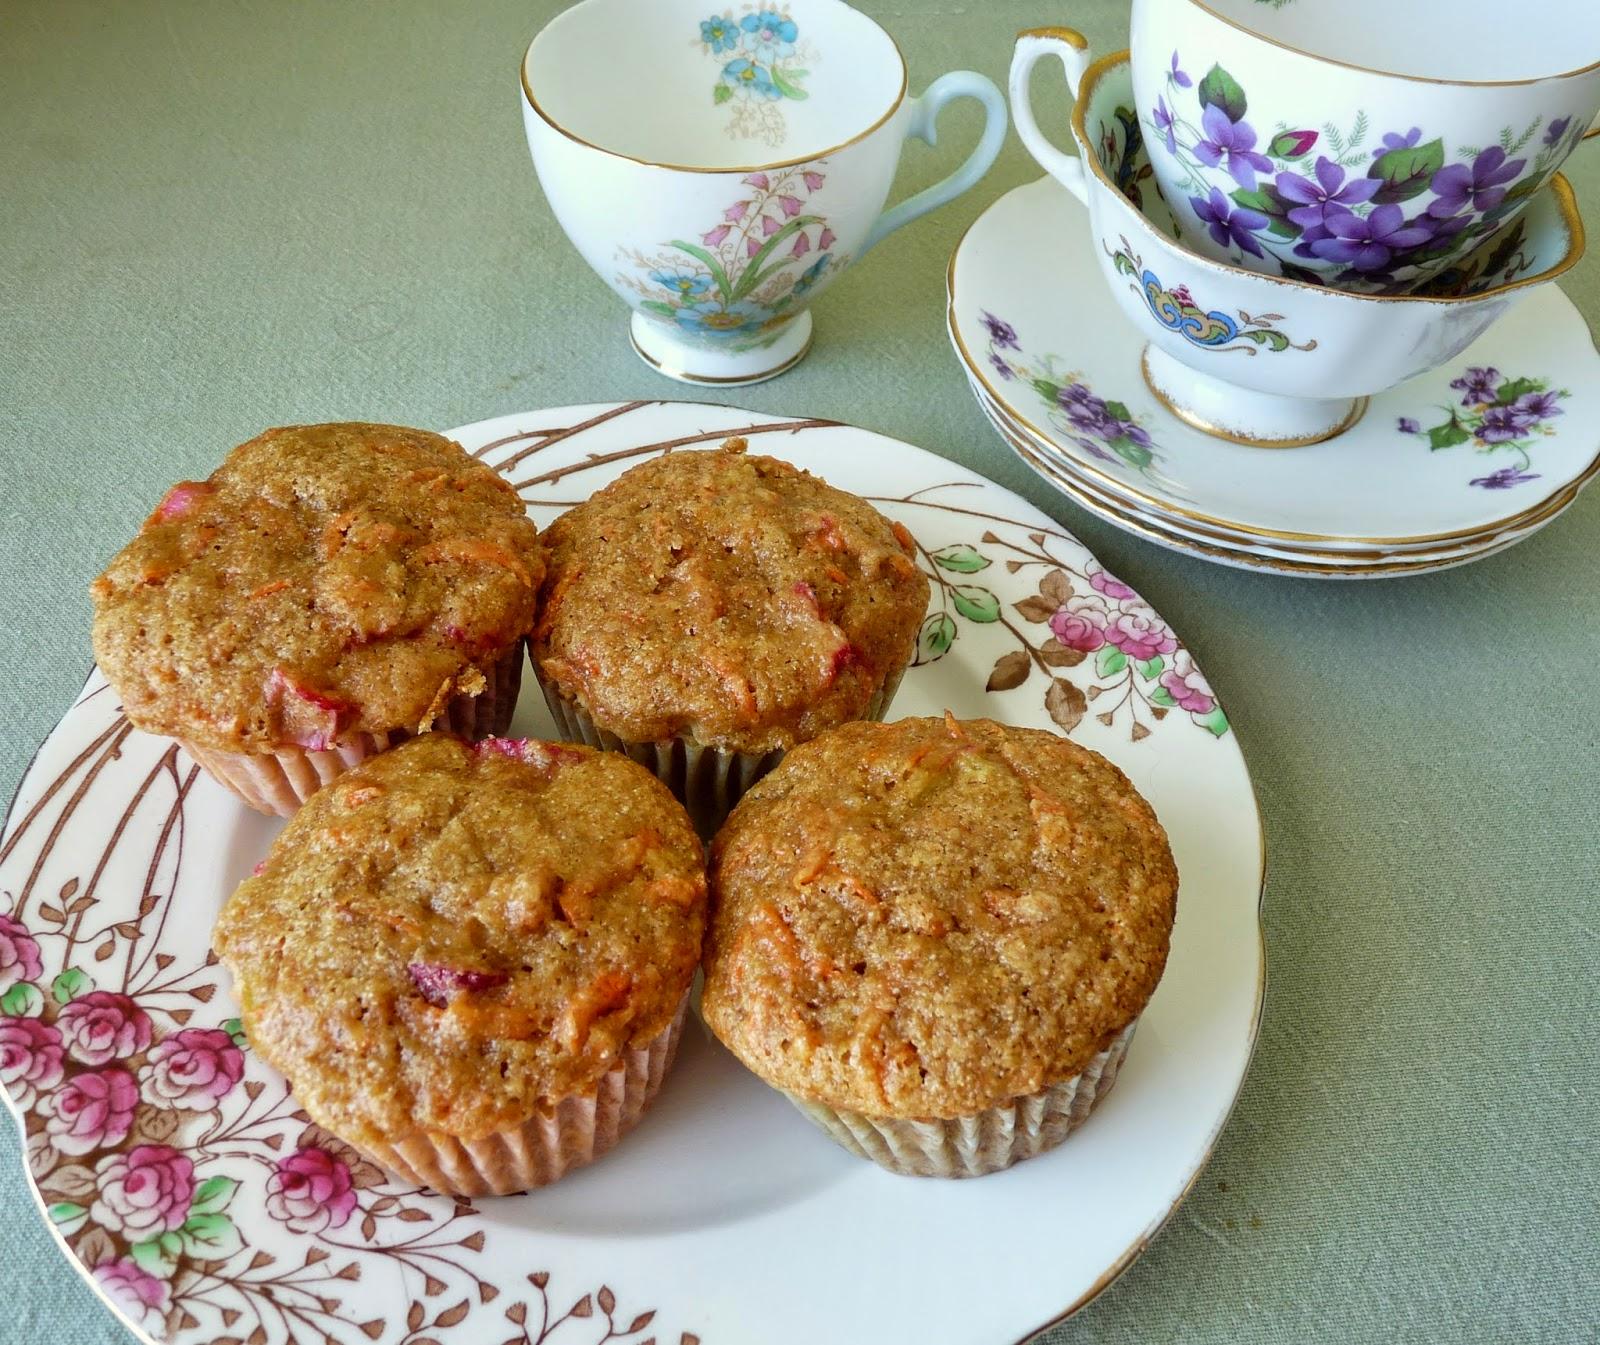 Rhubarb & Carrot Muffins